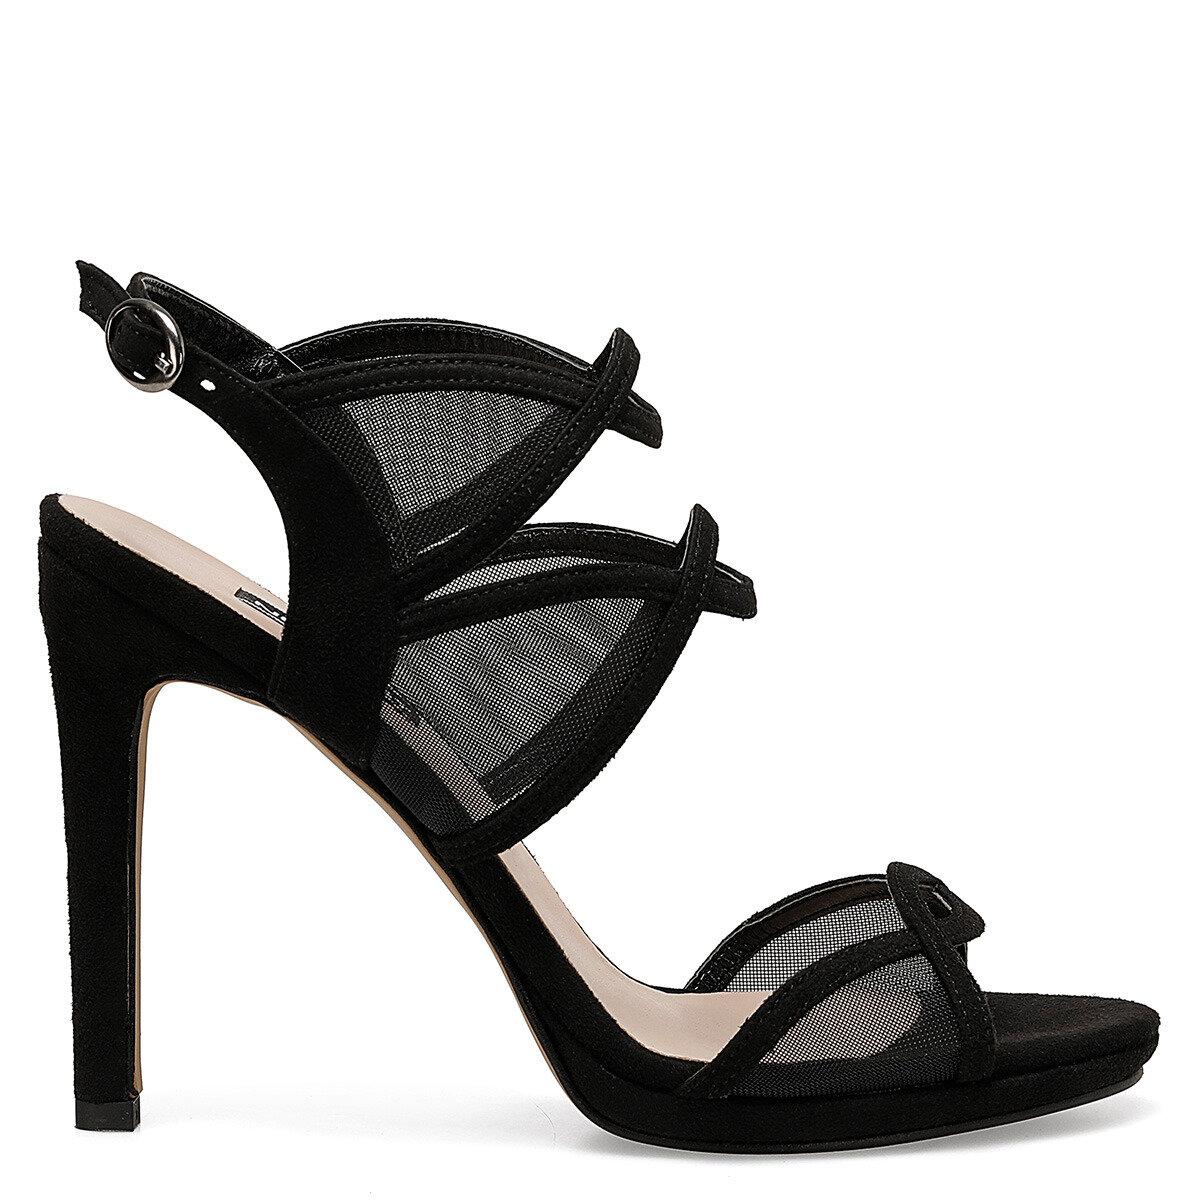 MIYA Siyah Kadın Topuklu Sandalet